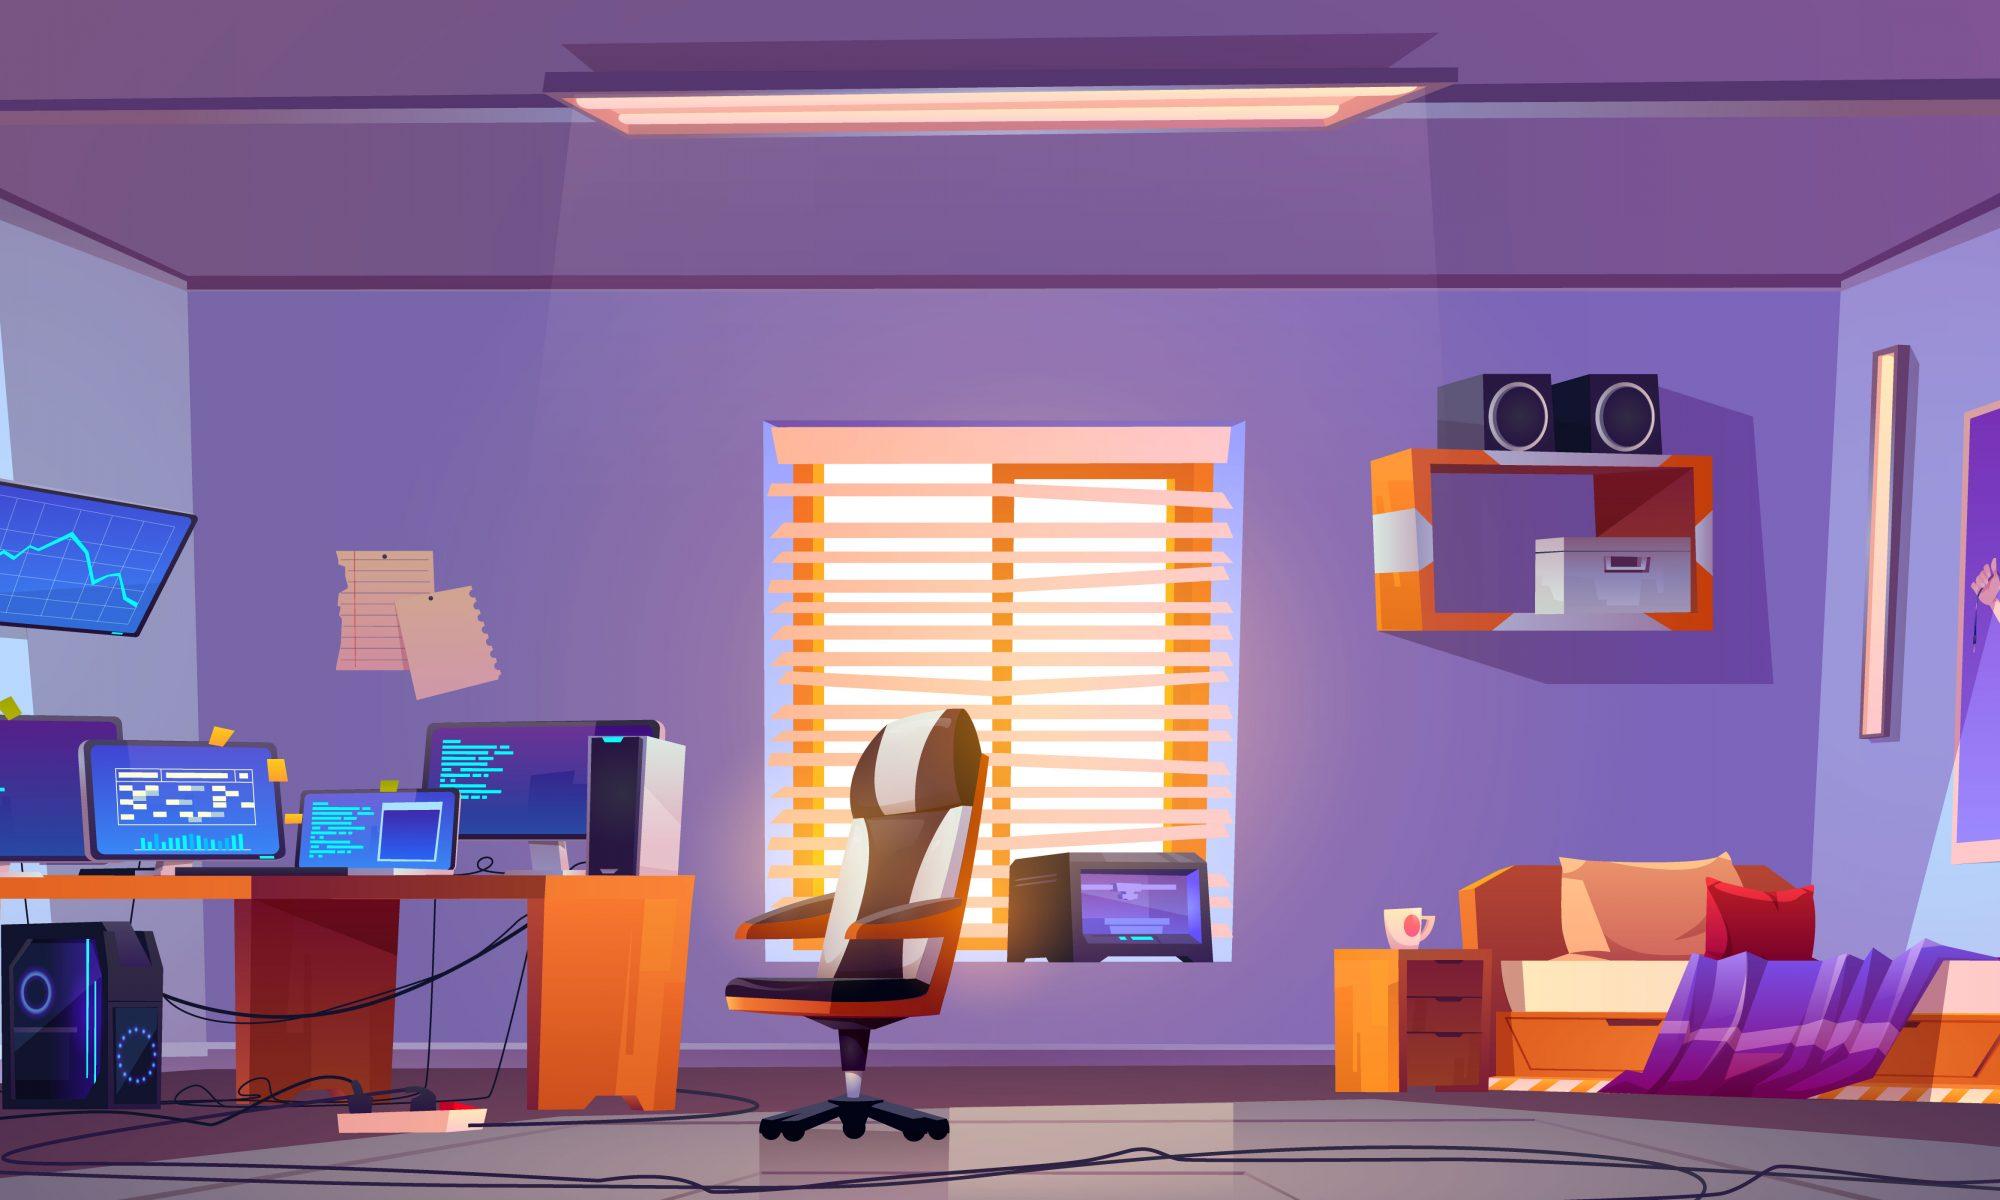 Teenager boy bedroom interior, computers on desk Designed by upklyak / Freepik